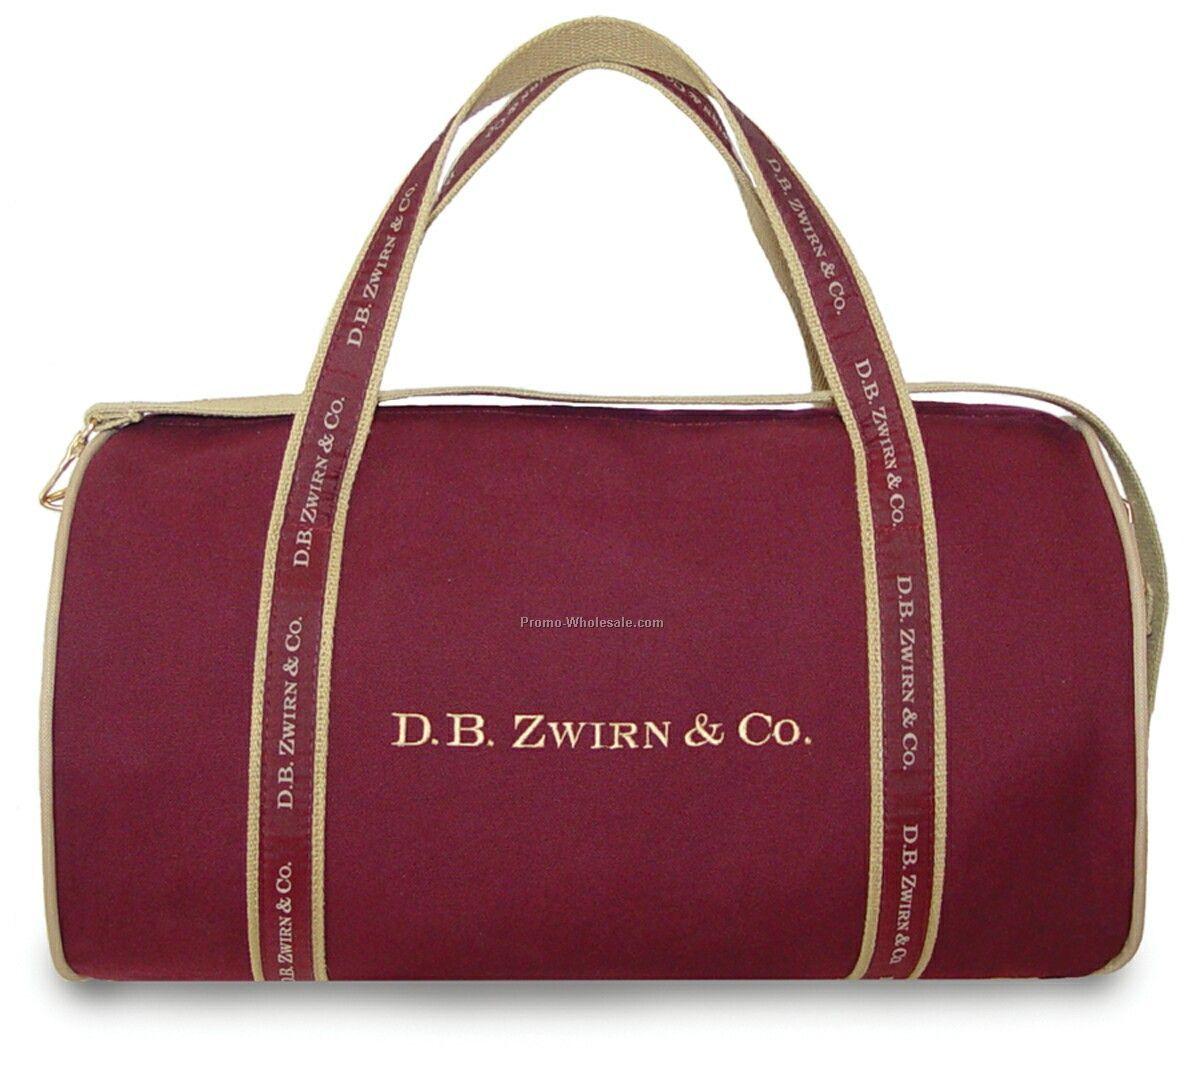 719m v b   duffle bag with